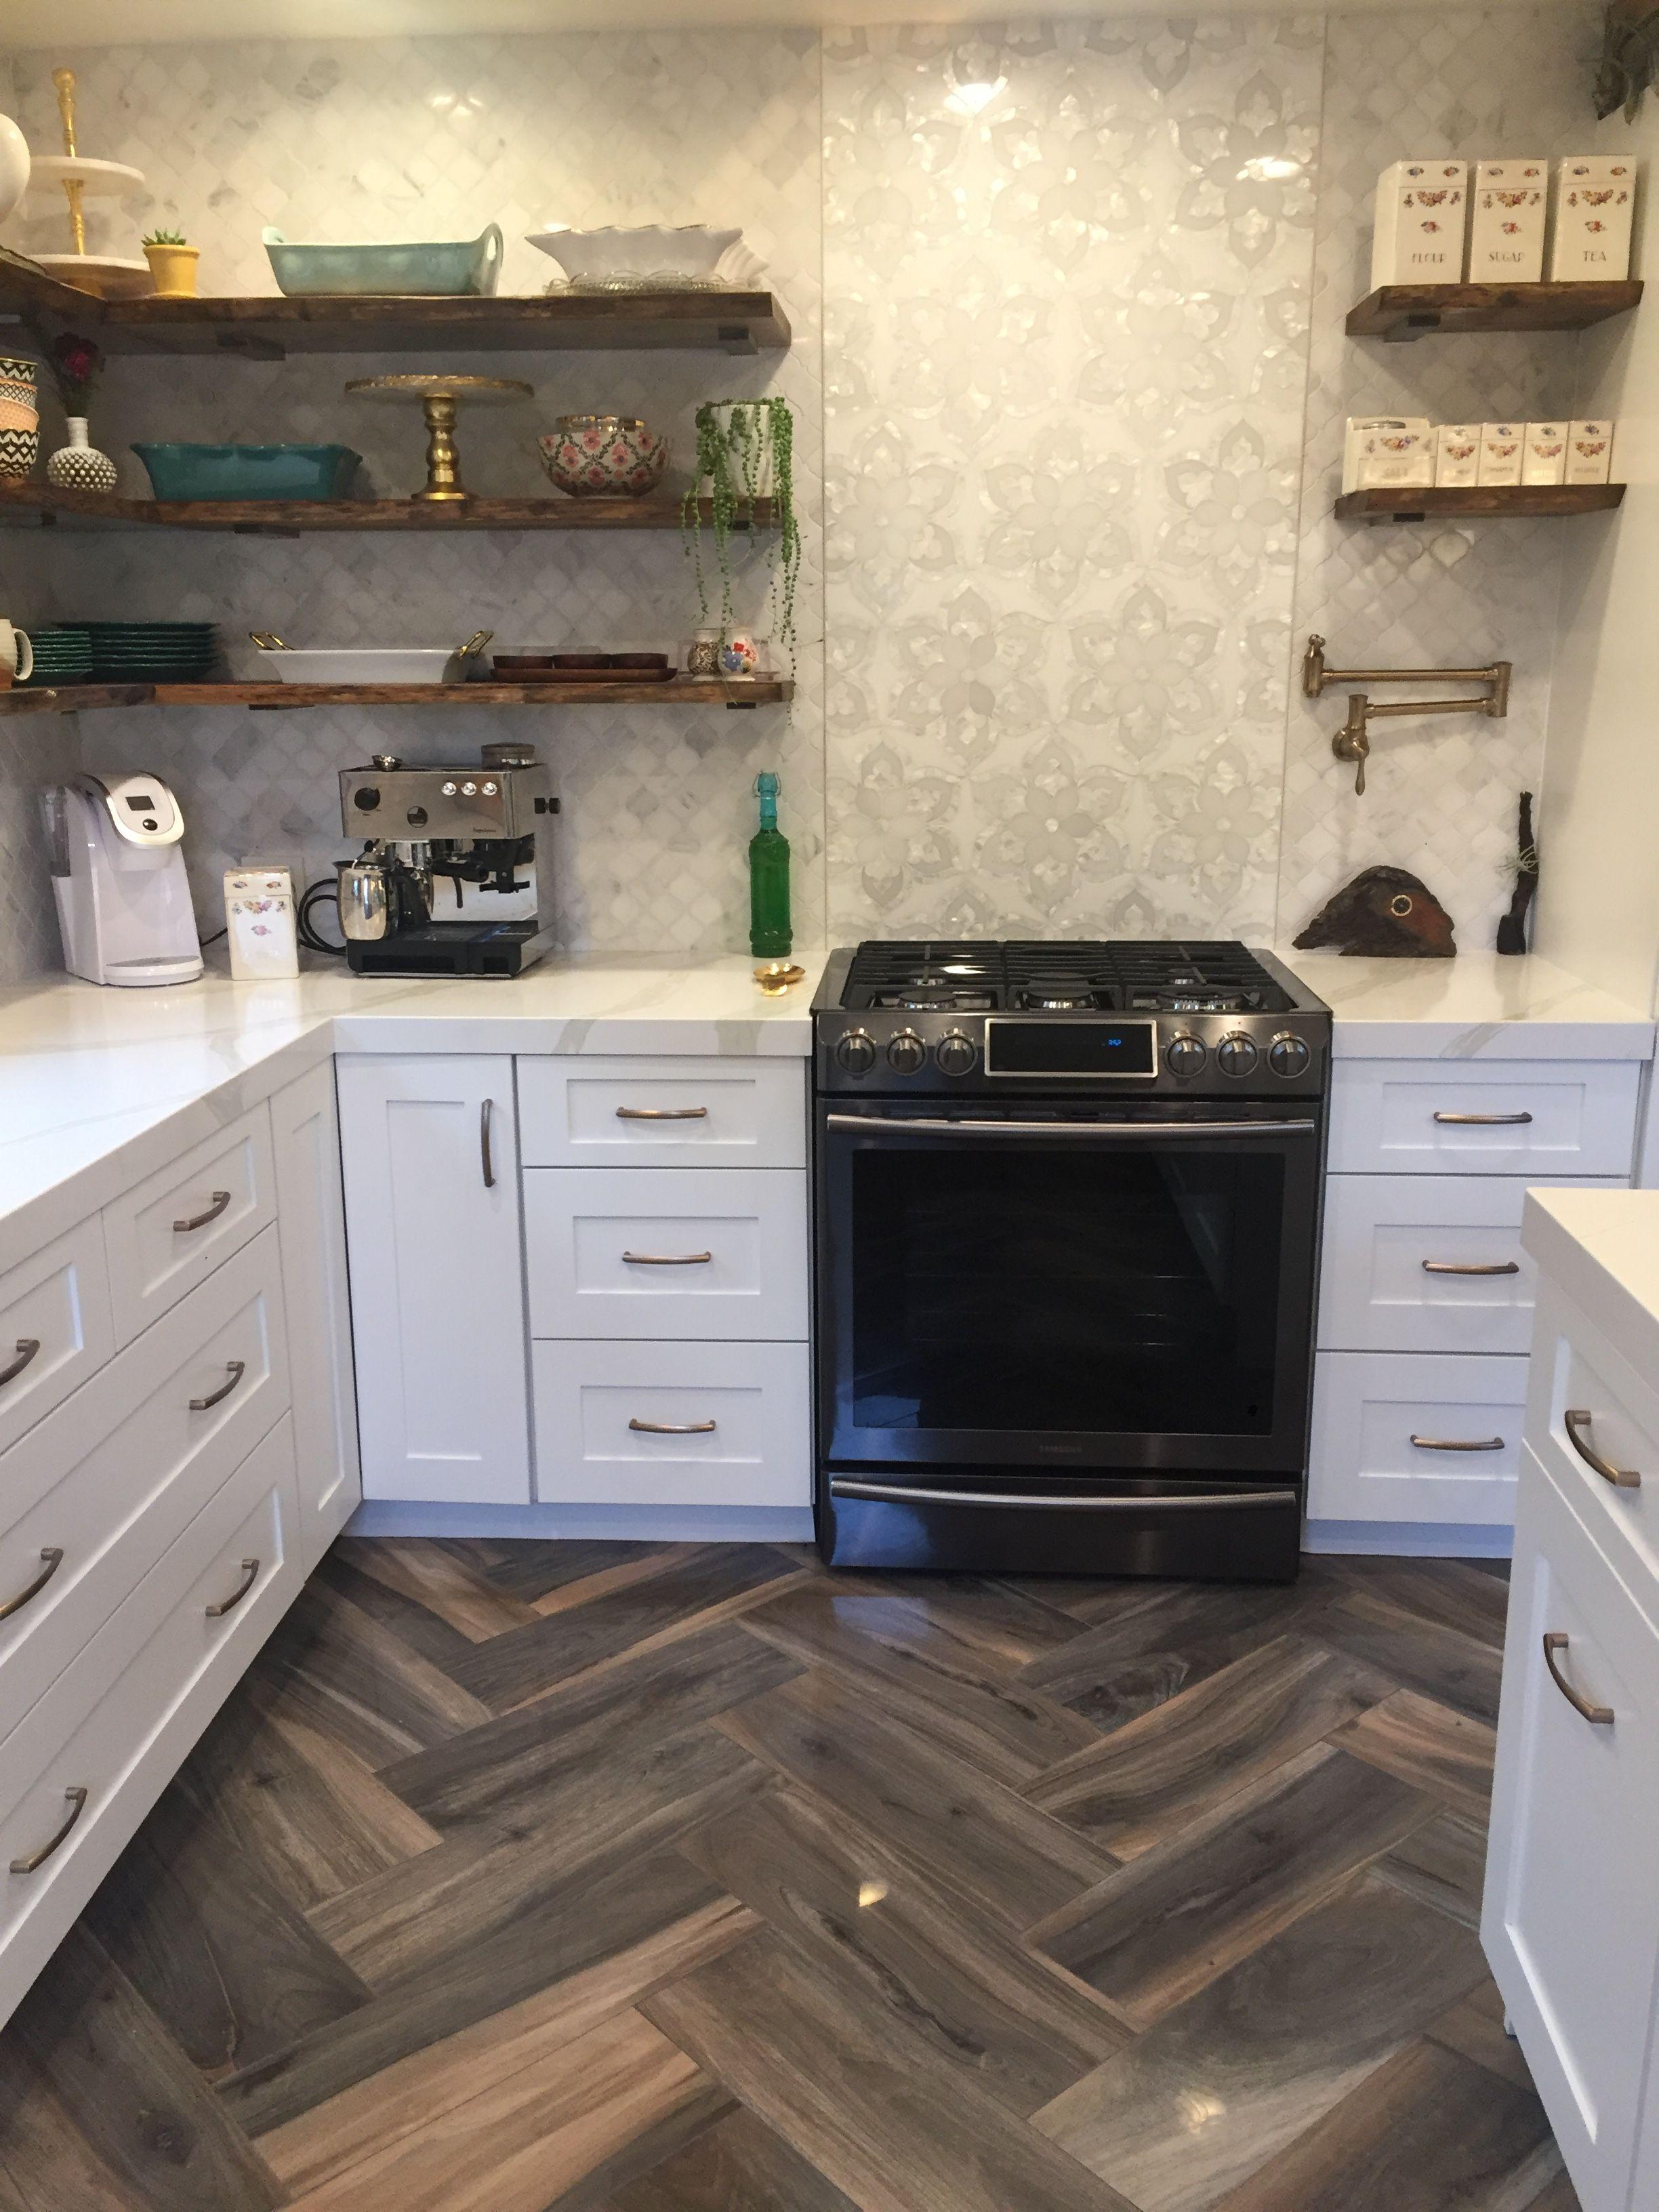 Kitchen Design With Wood Plank Porcelain Tile Flooring Quartz